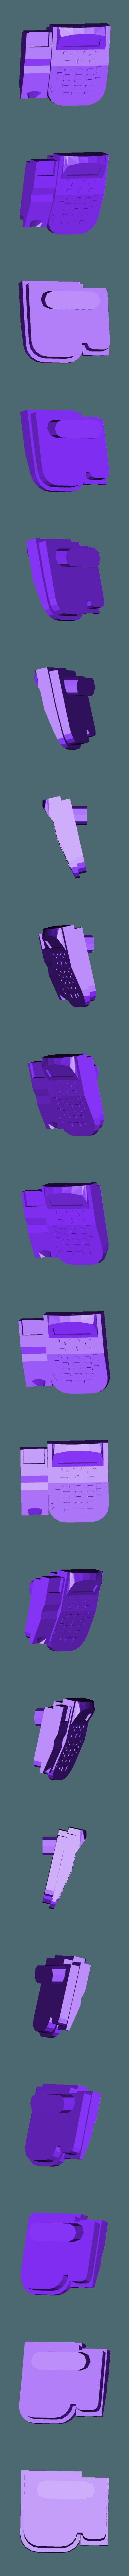 telephone de bureau poste.stl Download free STL file Telephone +ps4 • 3D printer design, RCGANG93